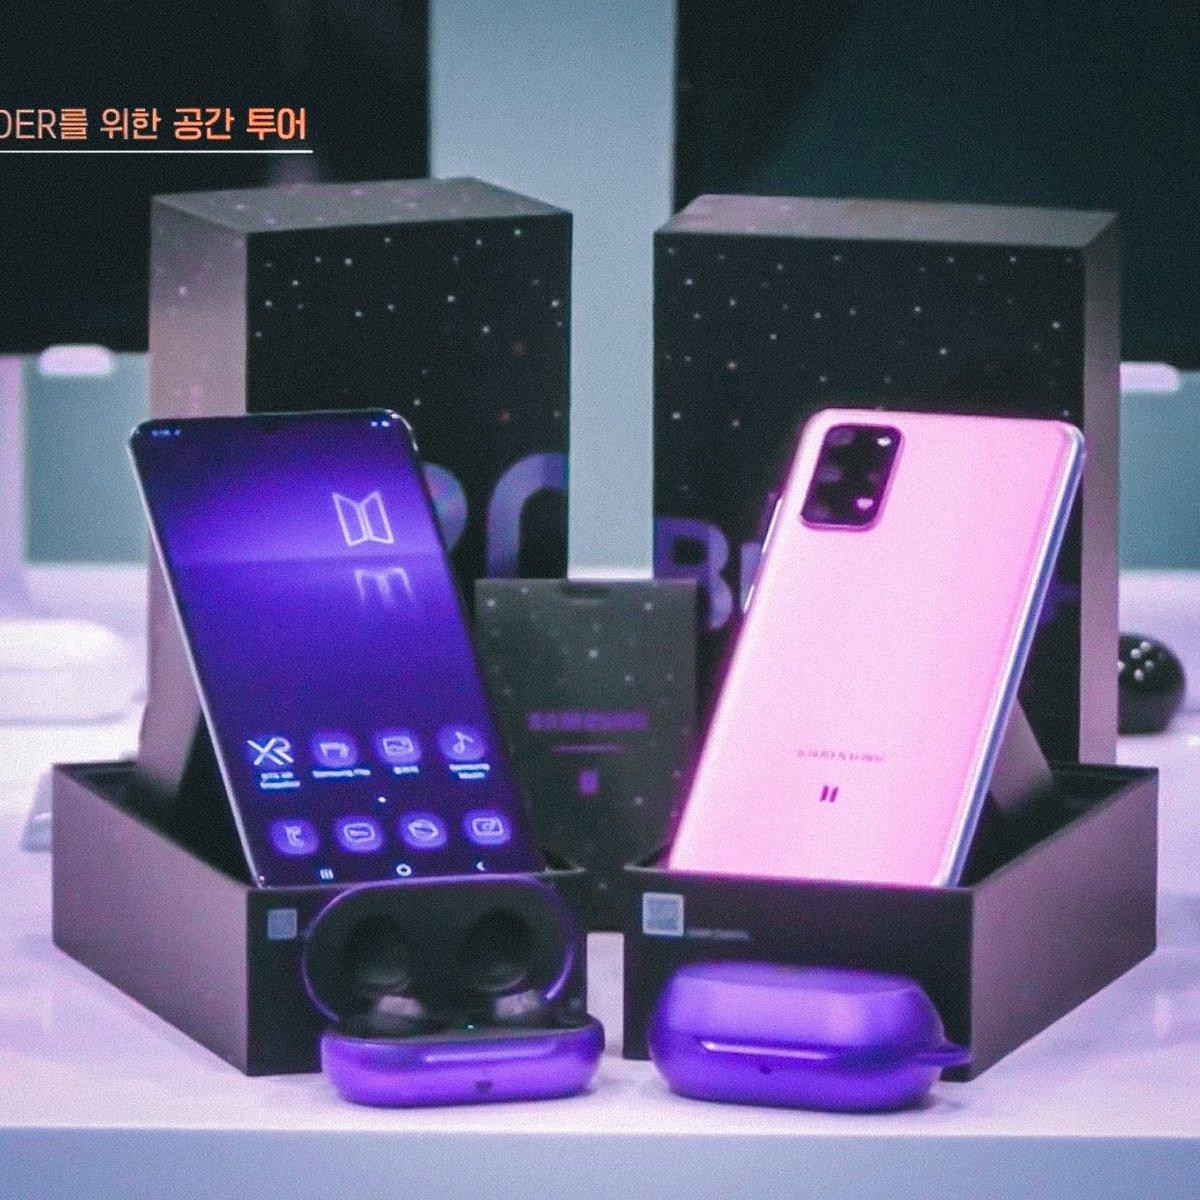 [EP.3] I-LANDERS said buy Samsung Galaxy (BTS Edition)   #YouCanDoIt_ILAND #ILAND_EP3 #ILANDonFIRE  #ILAND #I_LAND #아이랜드<br>http://pic.twitter.com/bWXpWVIooG